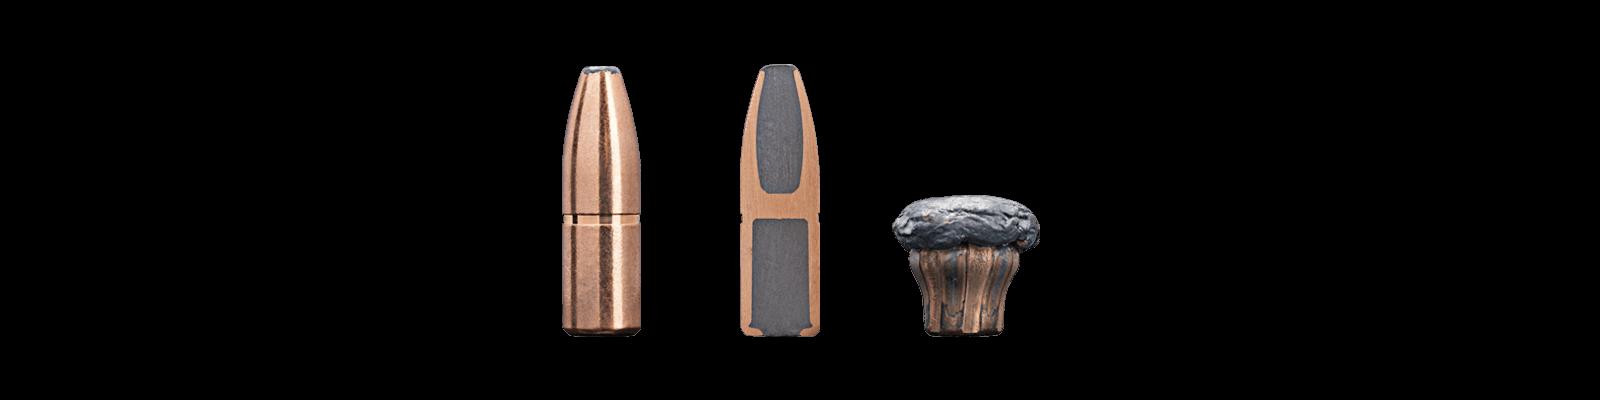 Sako 375 H&H Mag Twinhead II 19,4 g (480D) 10 kpl / ras